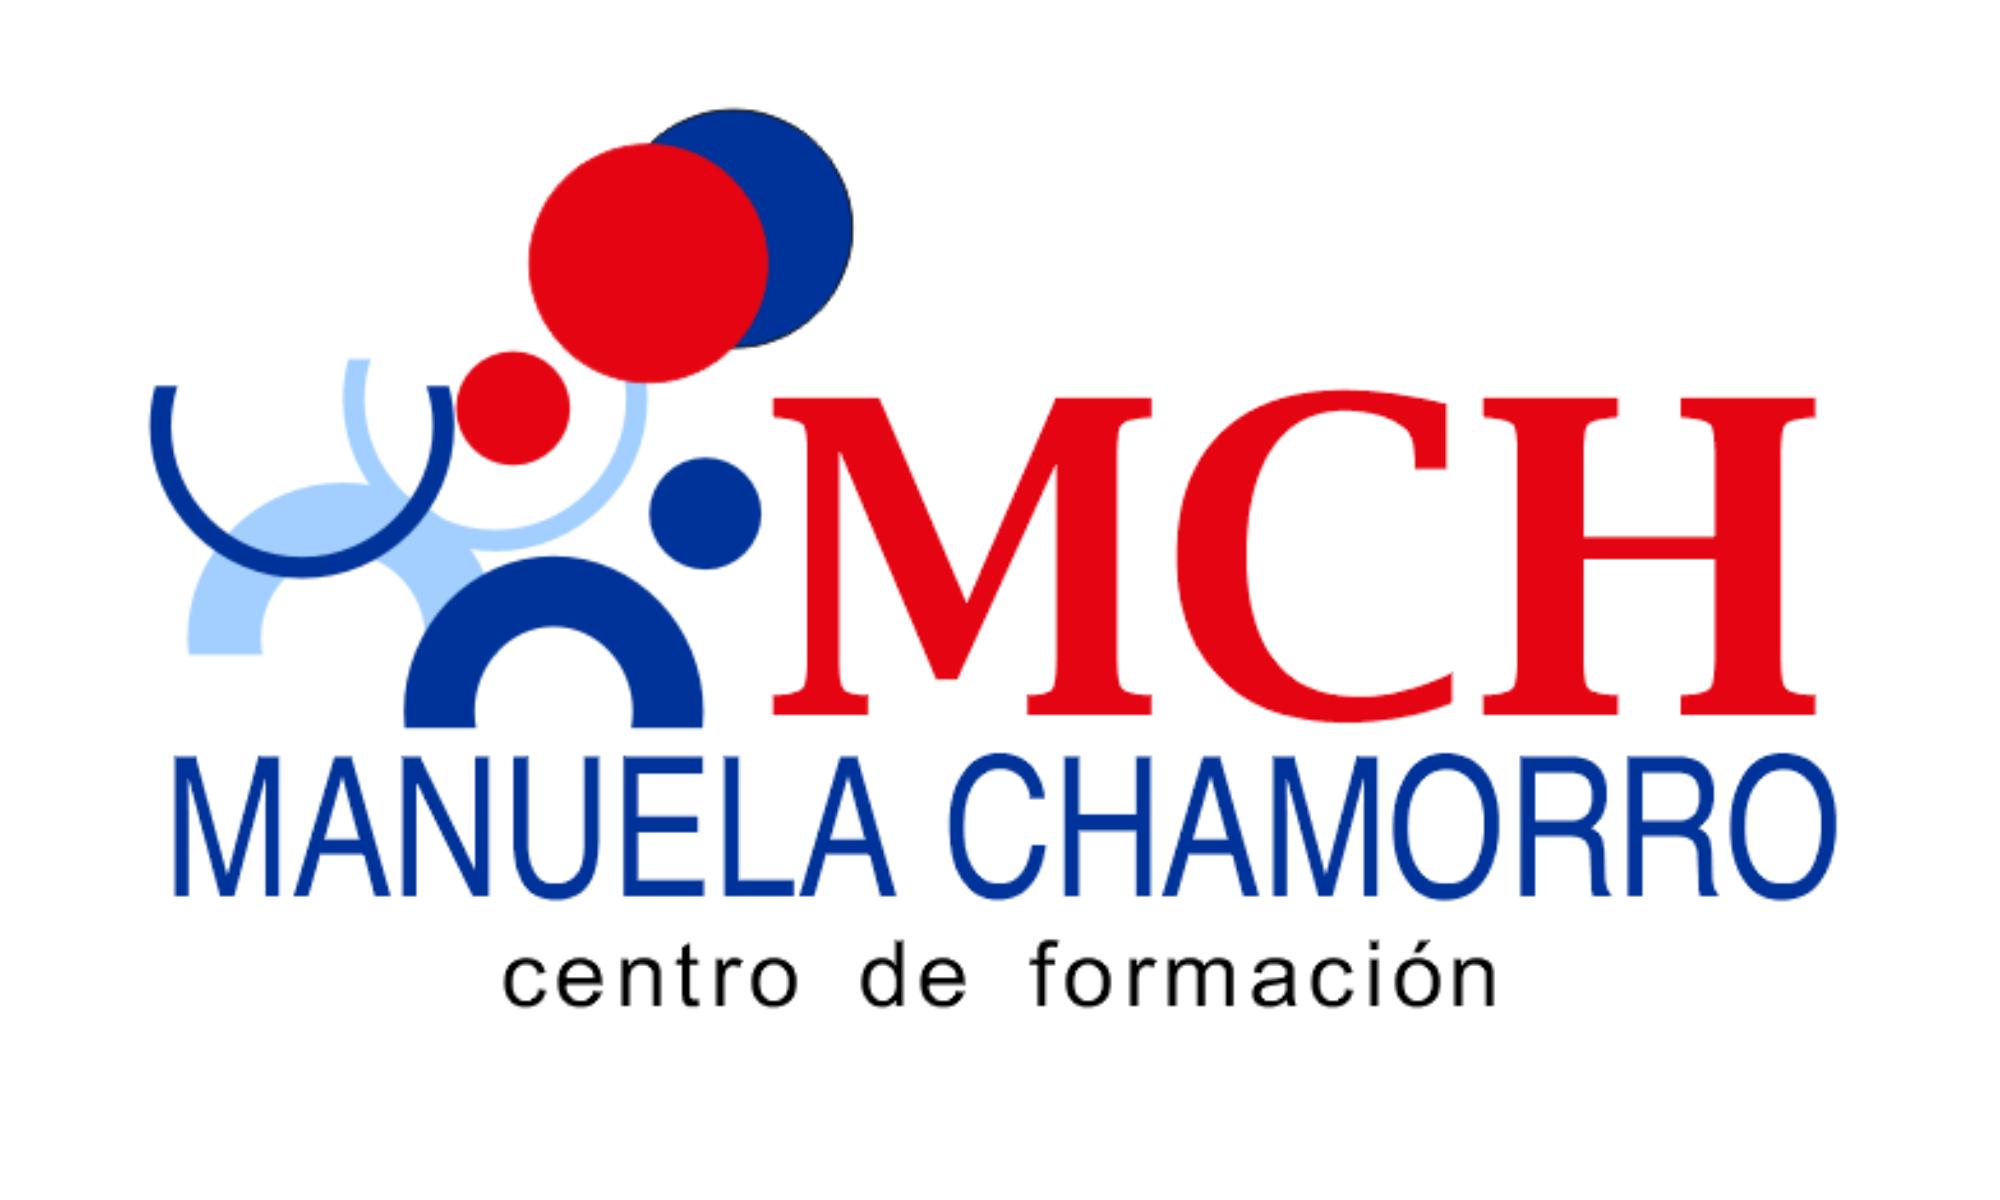 Manuela Chamorro